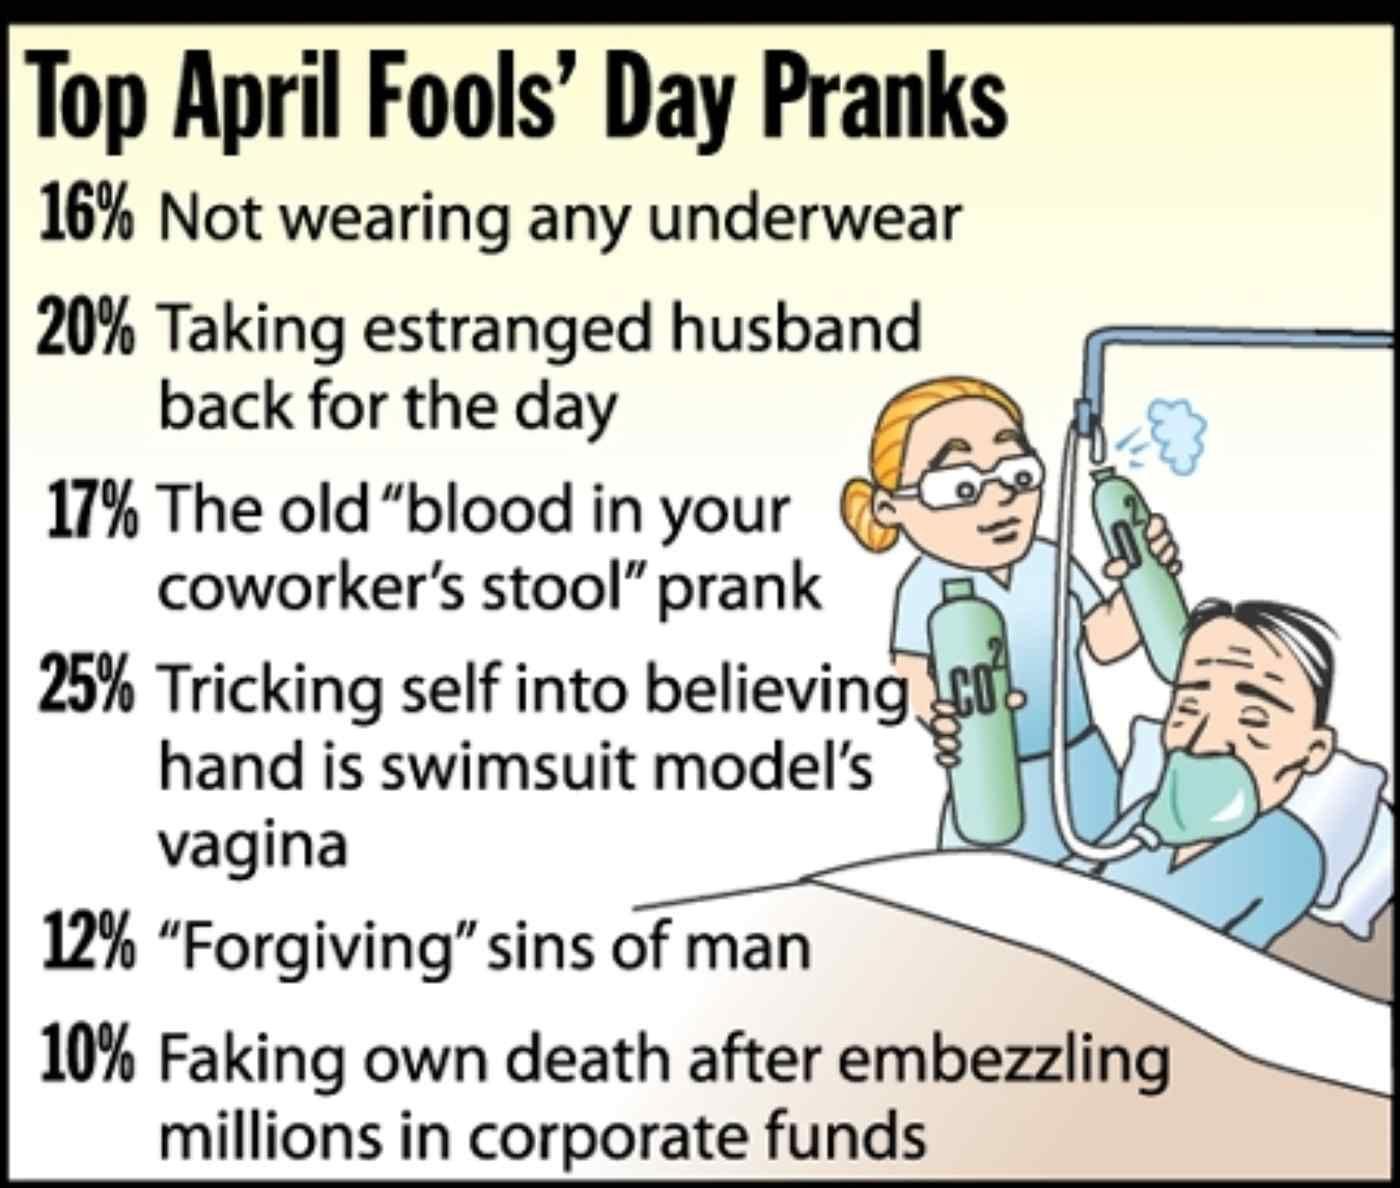 Top April Fools Day Pranks April Fools Day Jokes Funny April Fools Pranks Funny April Fools Jokes